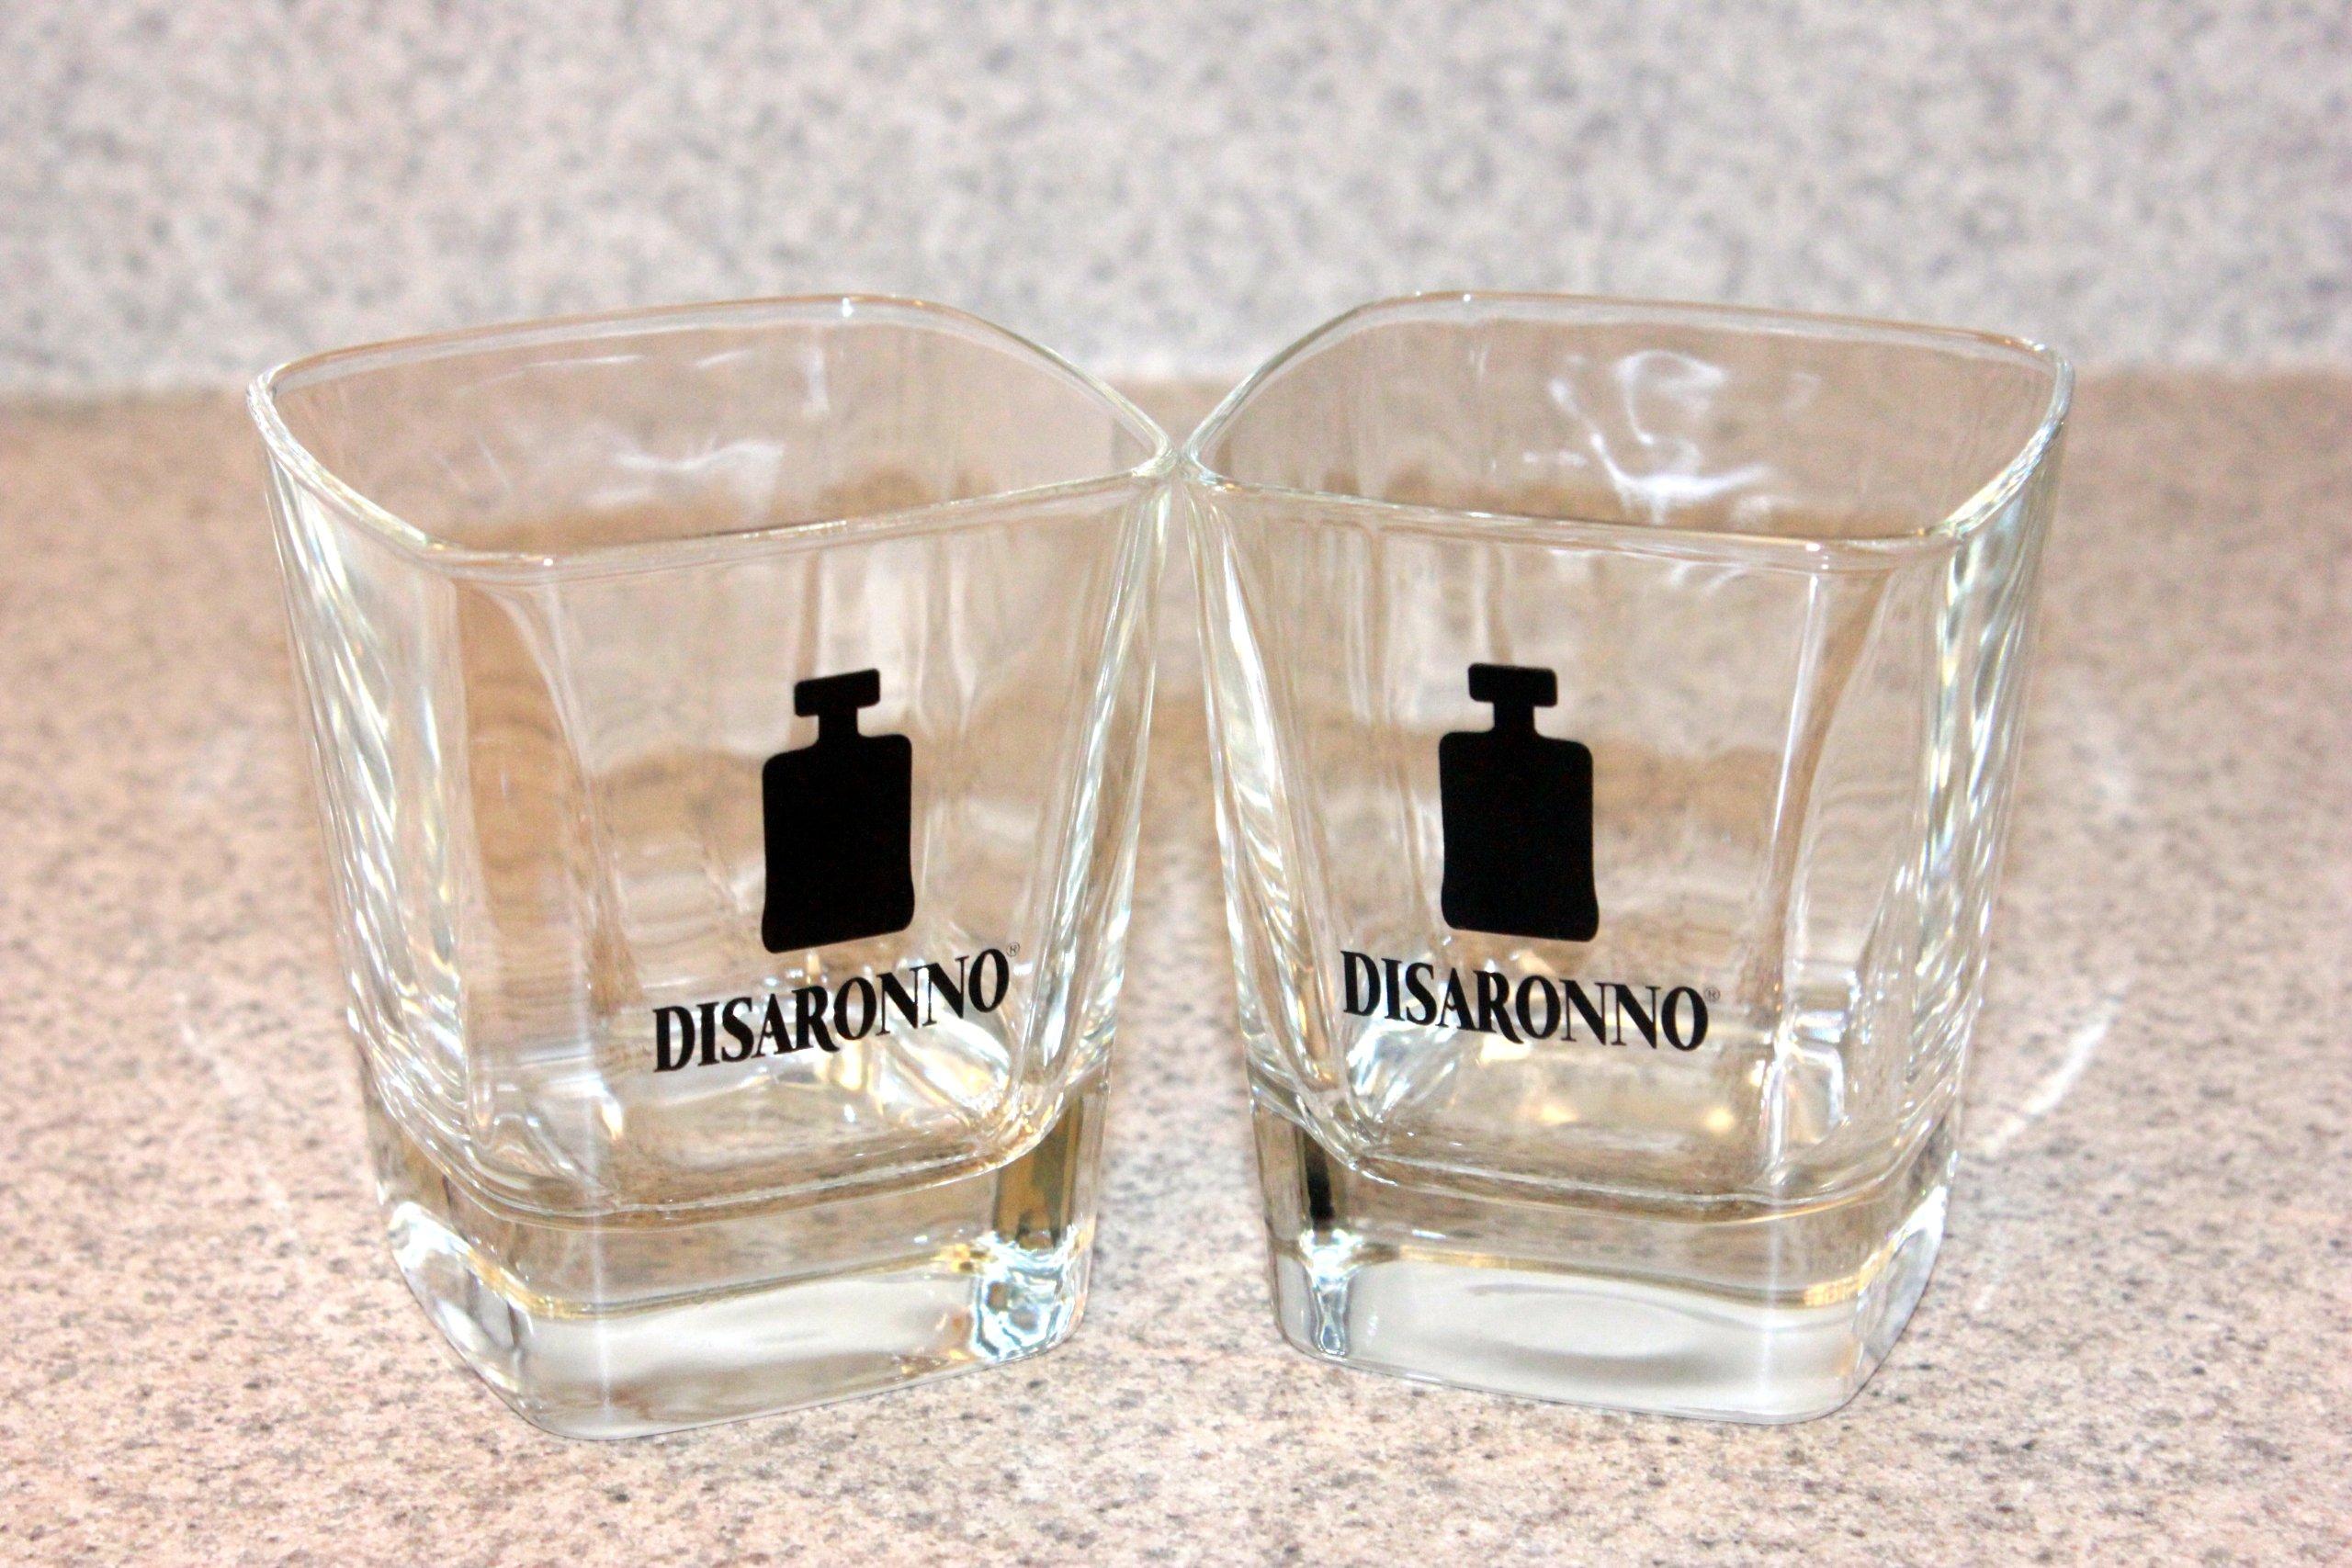 Disaronno Snifter Glass | Set of 2 Glasses